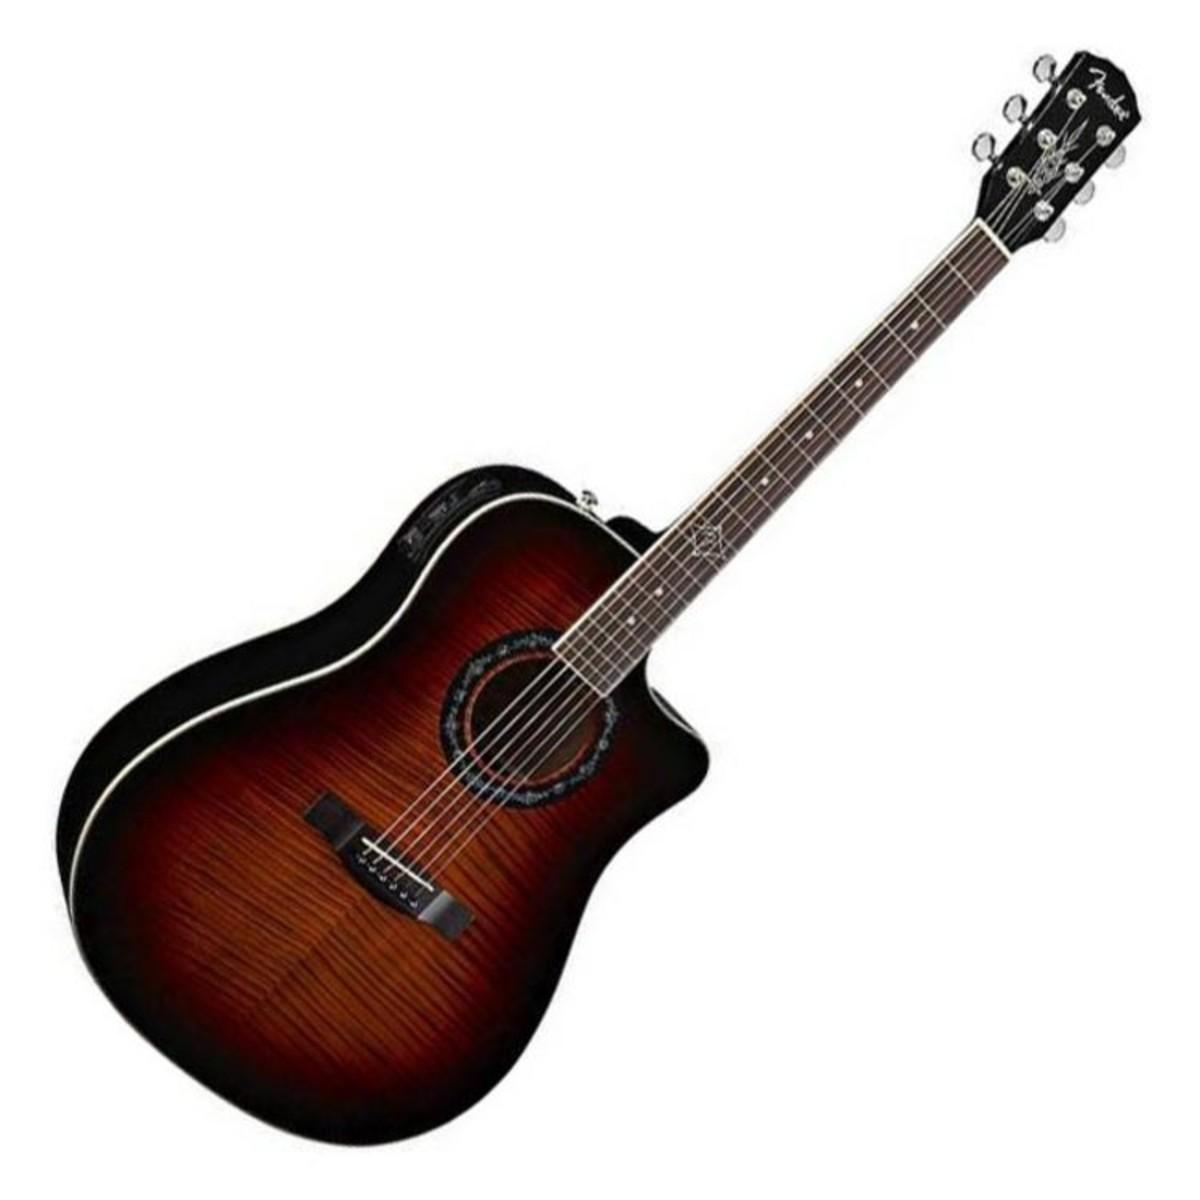 fender t bucket 300 ce electro acoustic guitar 3 colour burst at gear4music. Black Bedroom Furniture Sets. Home Design Ideas